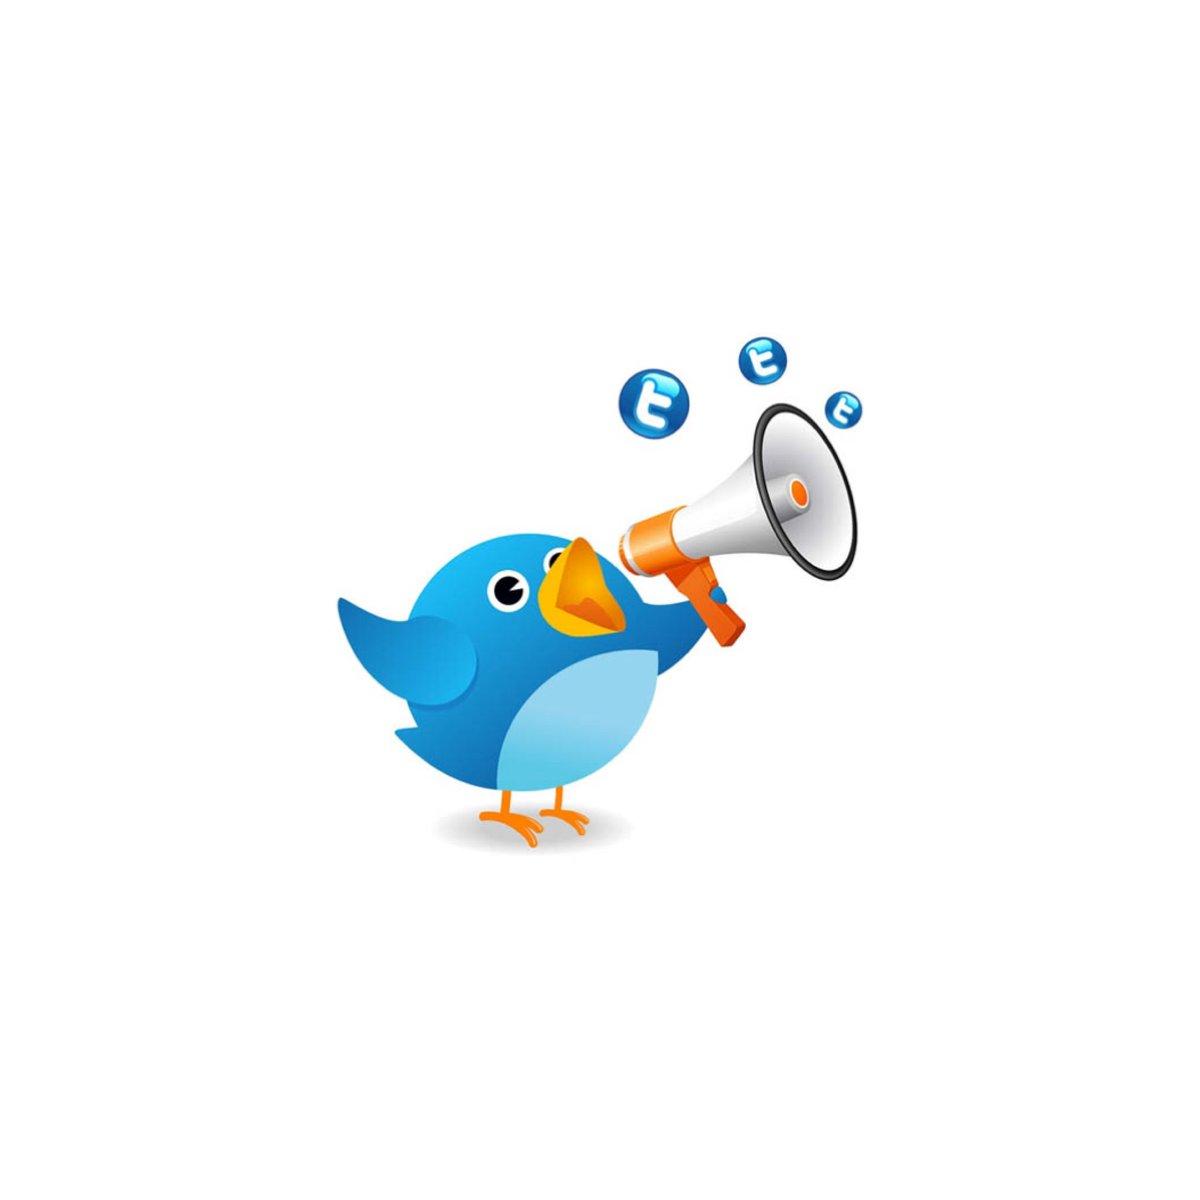 20 Powerful Ways to Use Twitter to Grow Your Business https://t.co/wPkvNVZSj8 #socialselling #smallbusiness https://t.co/lisxoe7FKl